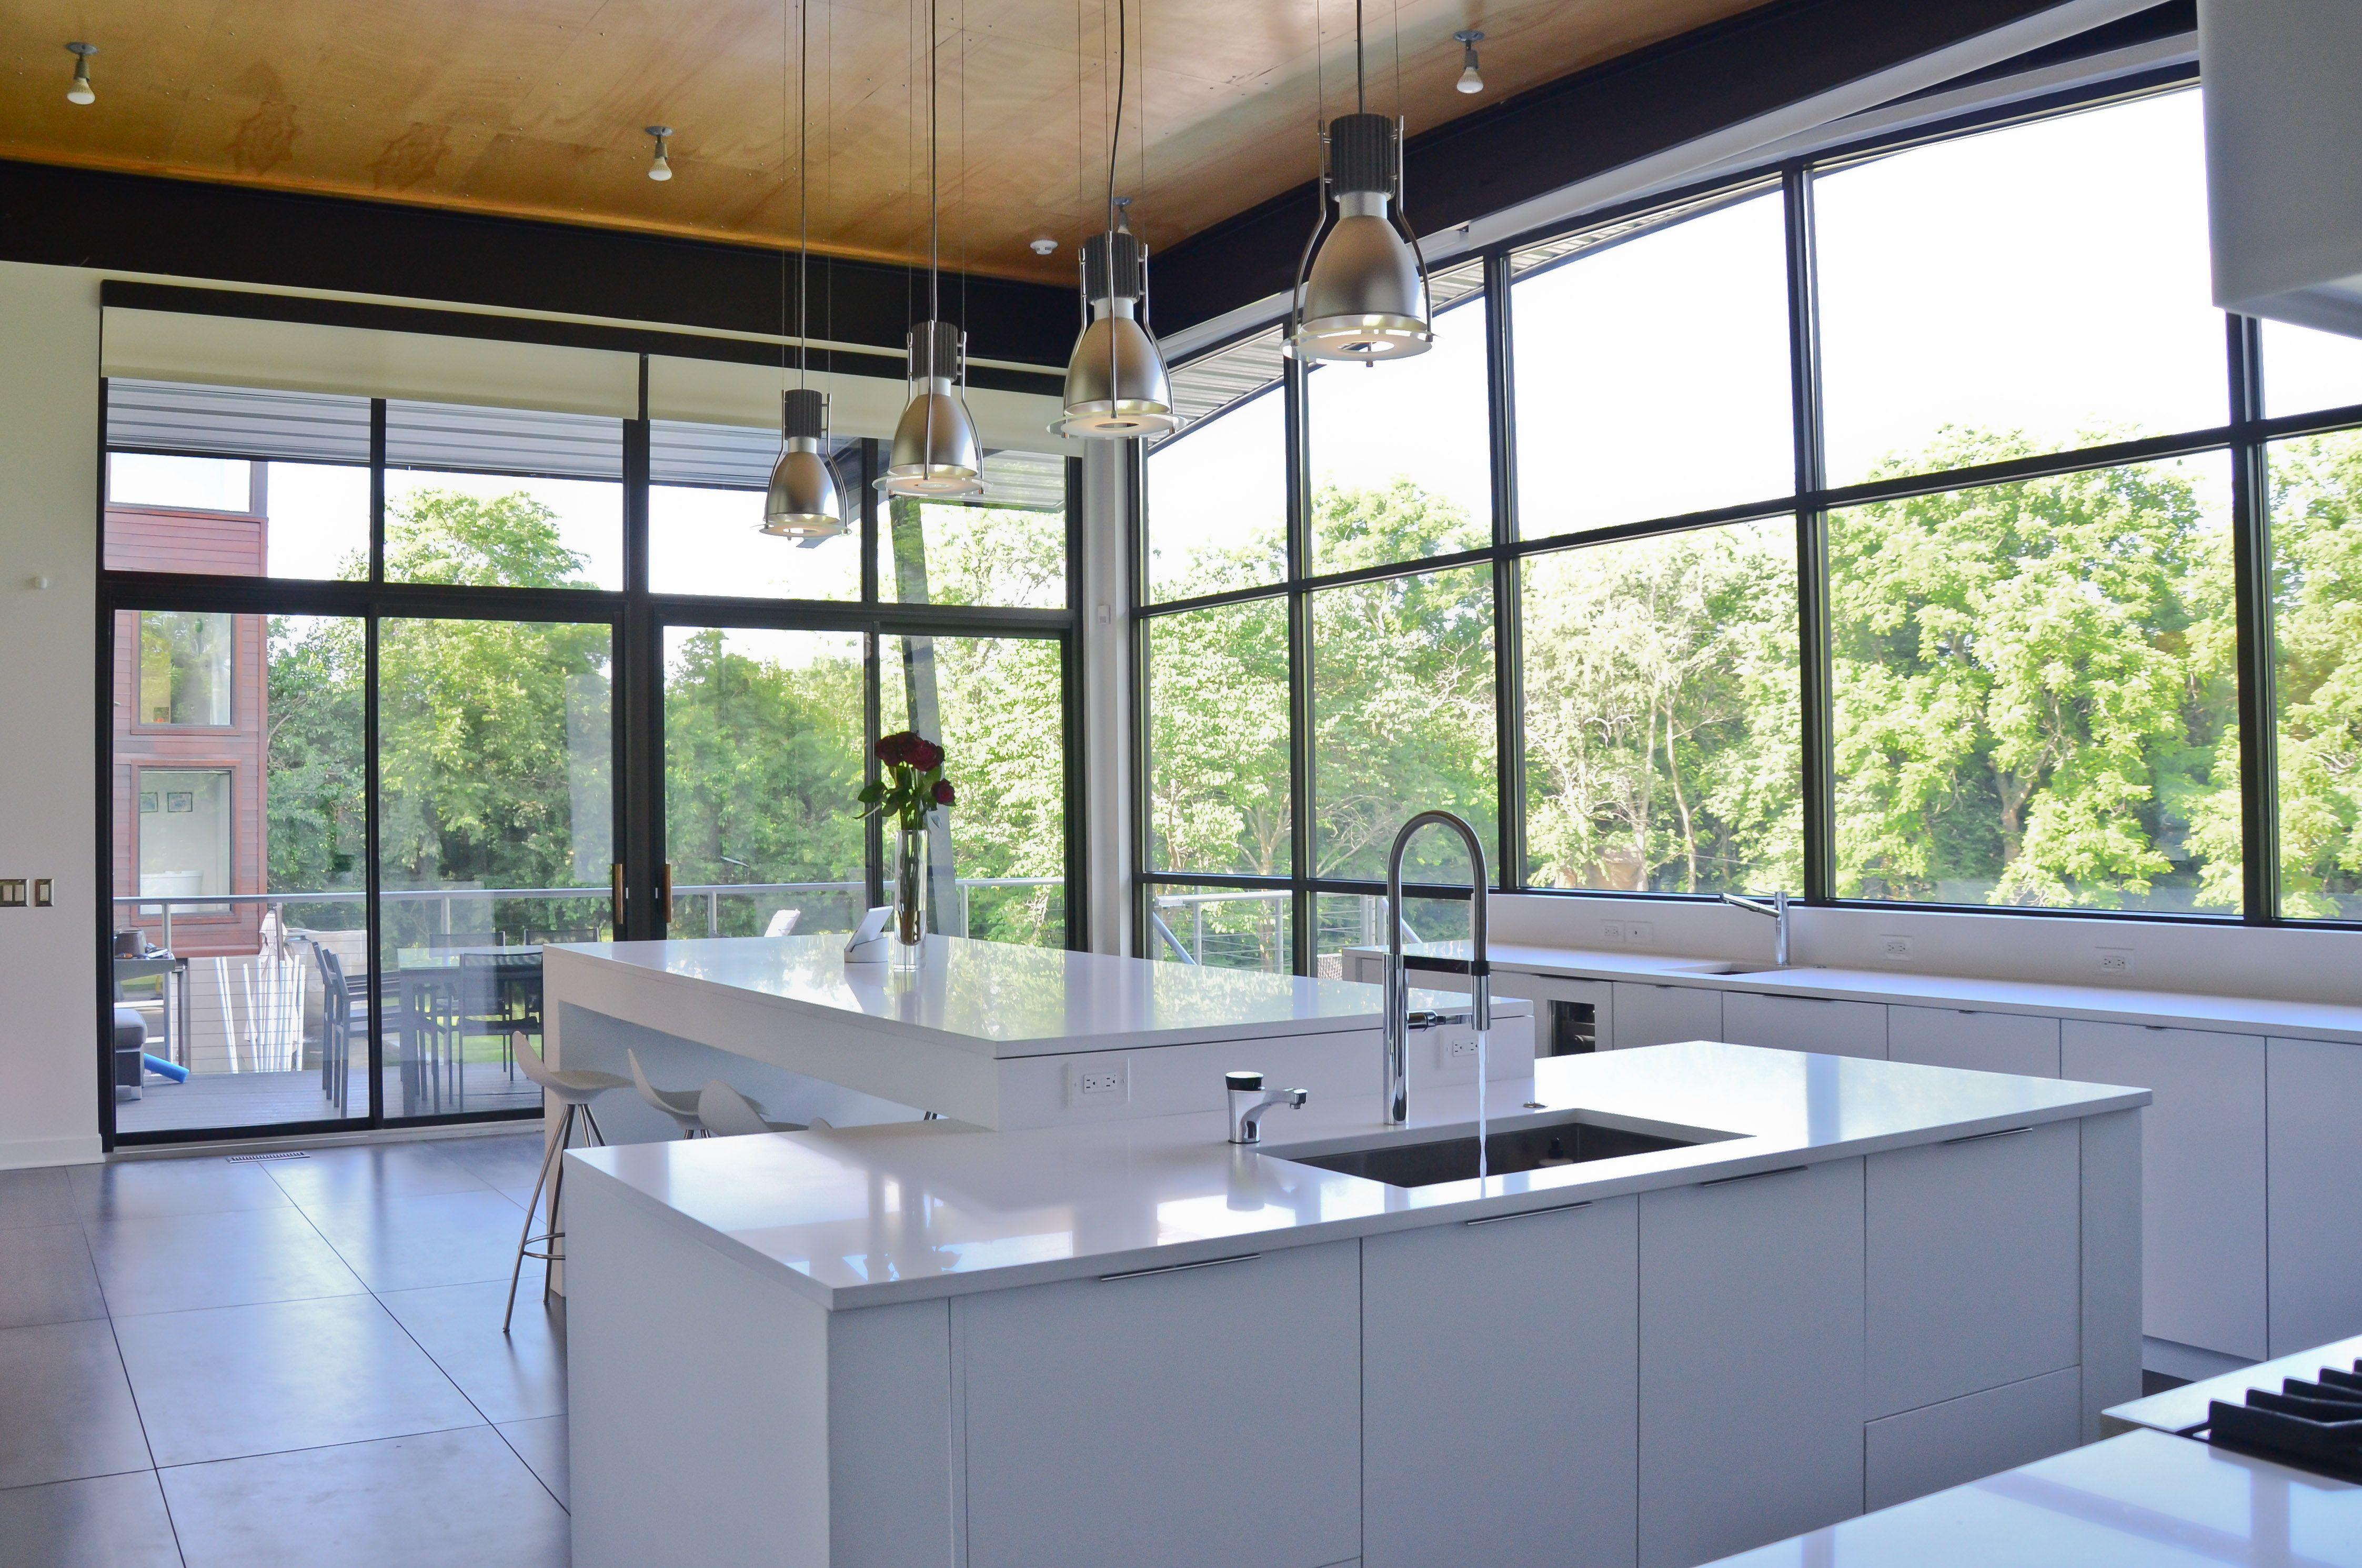 Plato Kitchen 15 Modern Kitchen Remodel Kitchen Contemporary Kitchen